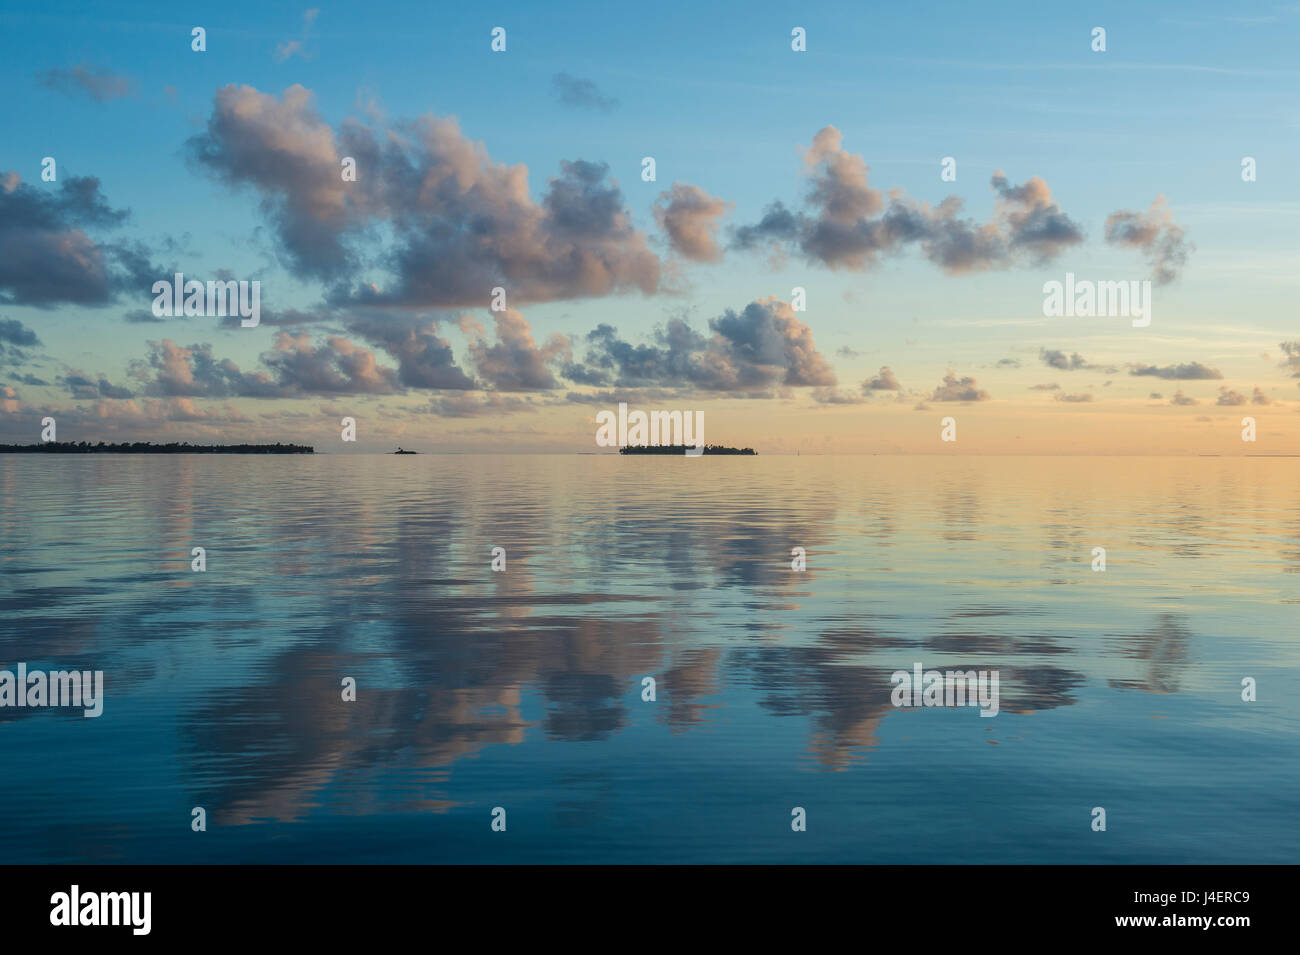 Sunset over the calm waters of Tikehau, Tuamotus, French Polynesia, Pacific - Stock Image